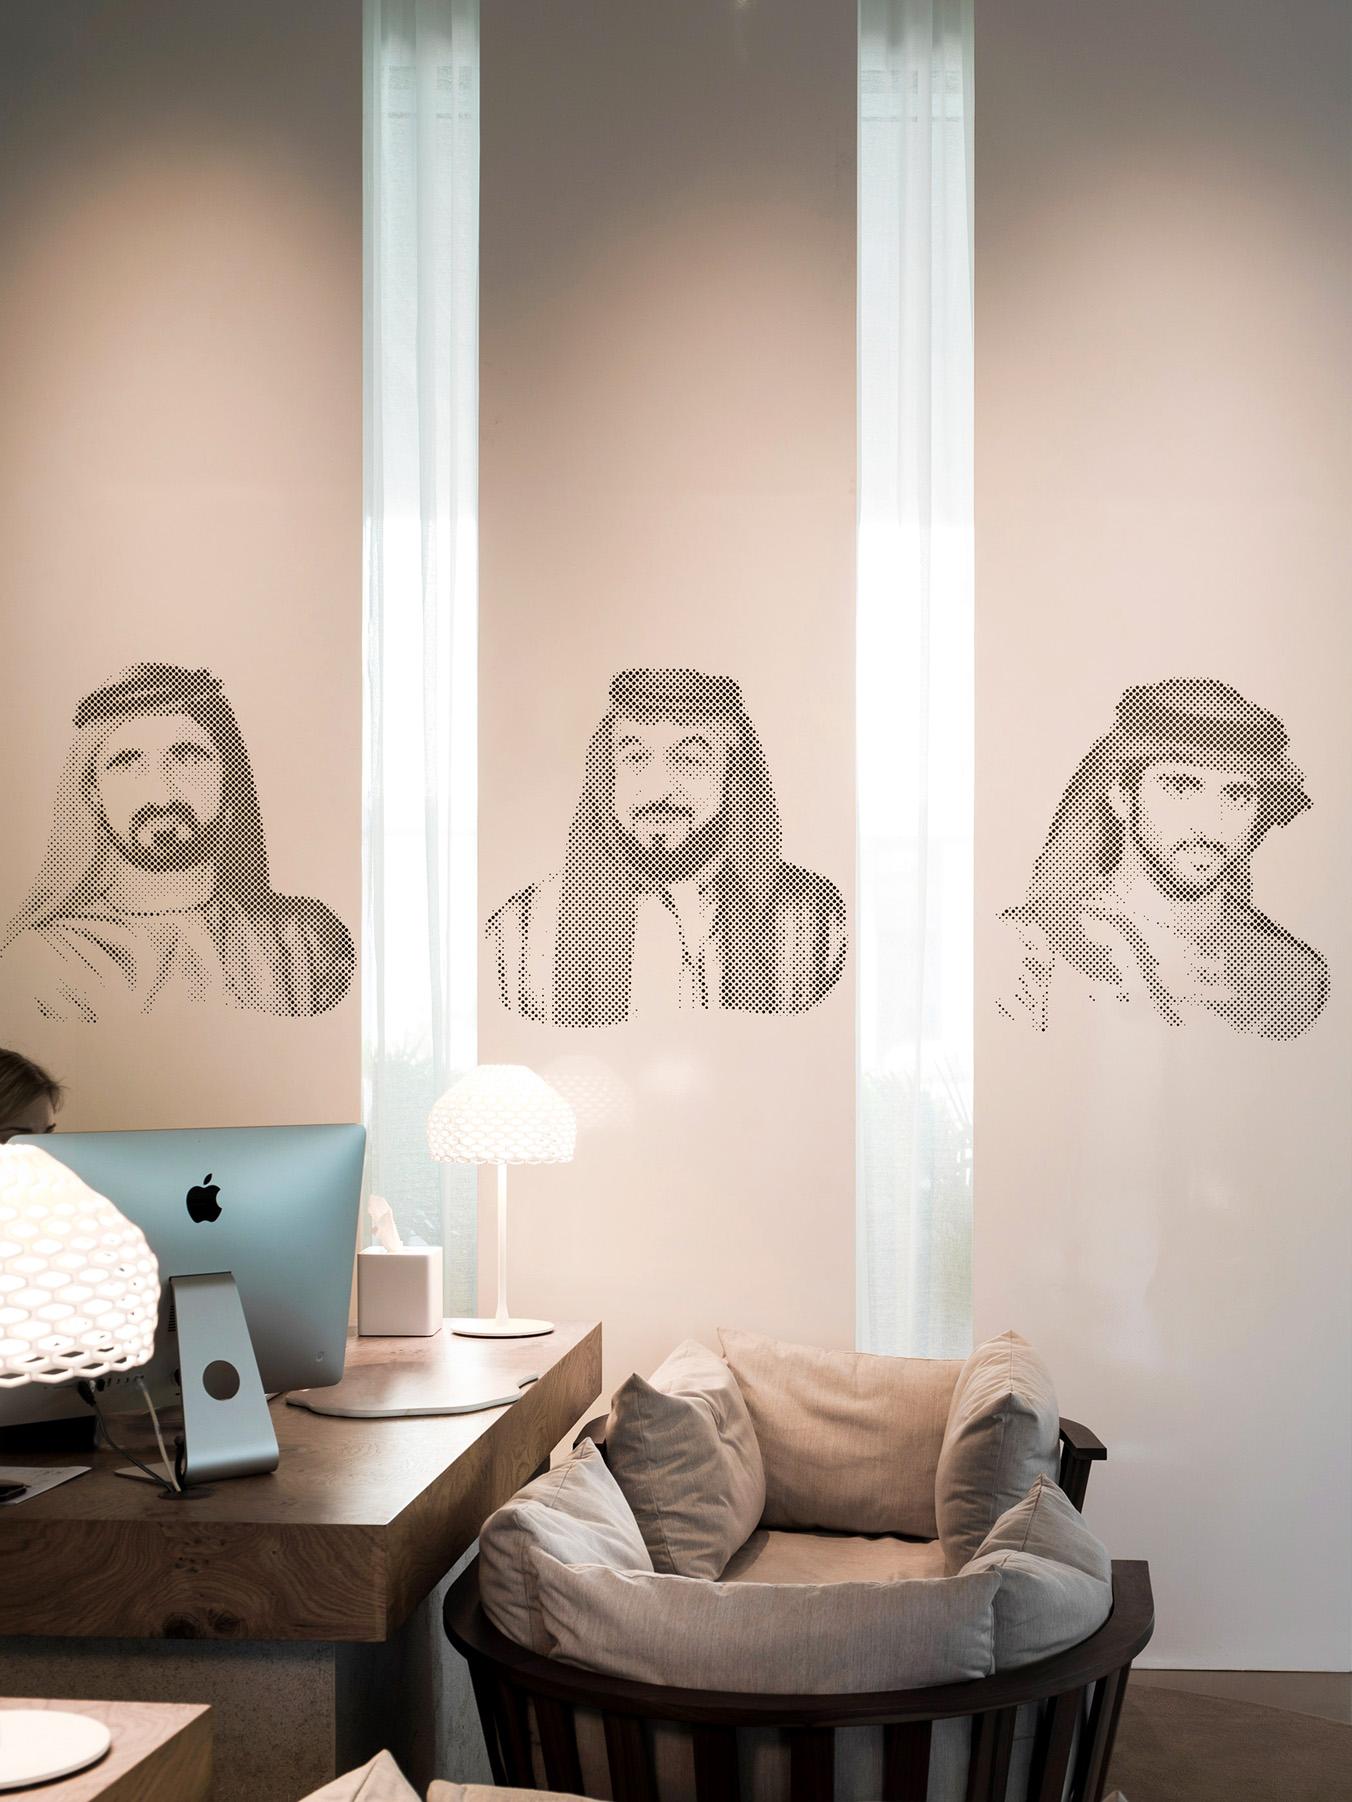 02-capsule-arts-projects-nikki-beach-sheikh-portraits.jpg